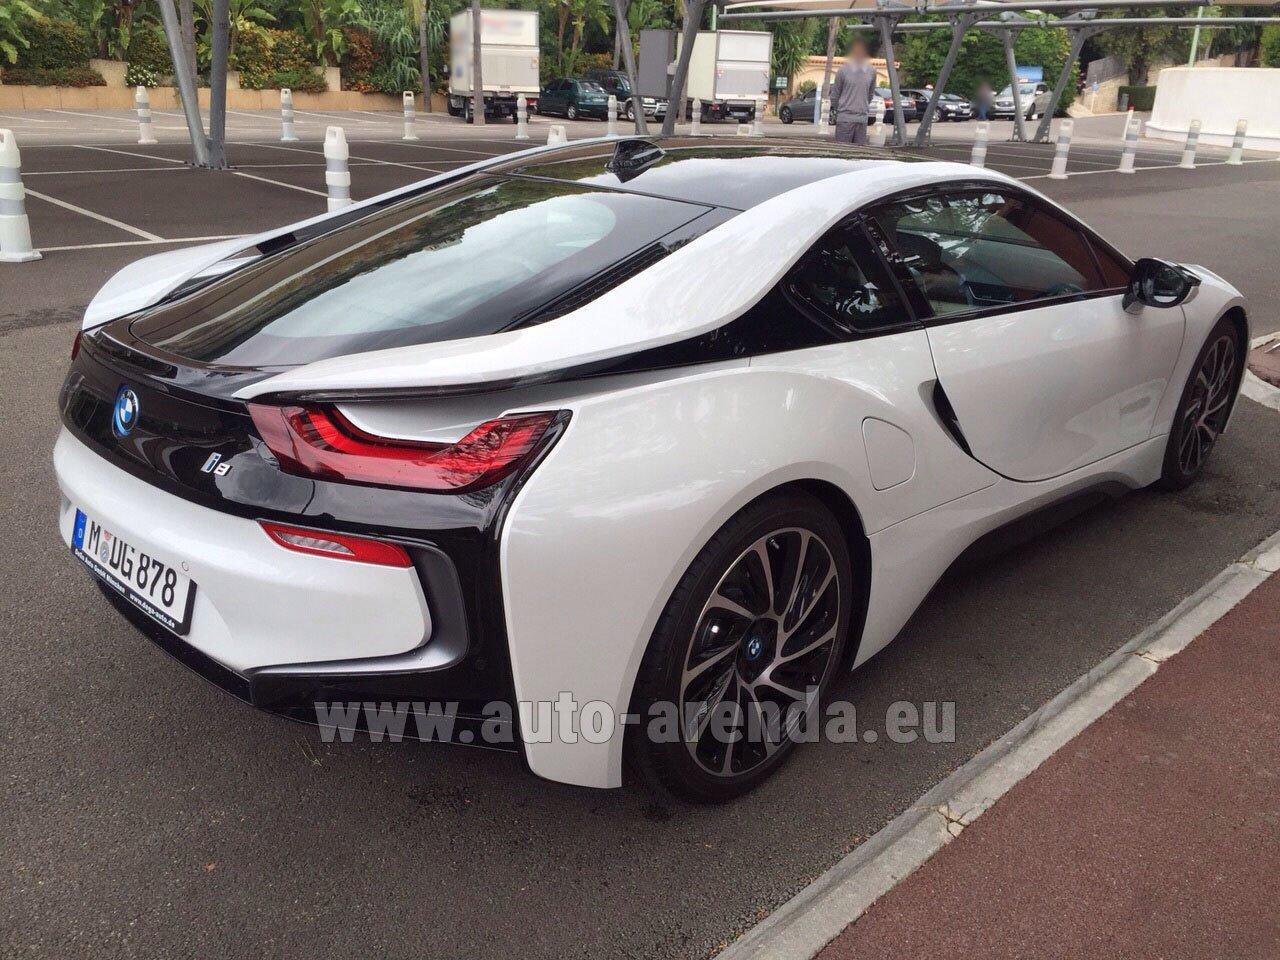 Аренда автомобиля БМВ i8 Купе Pure Impulse в Алгарве